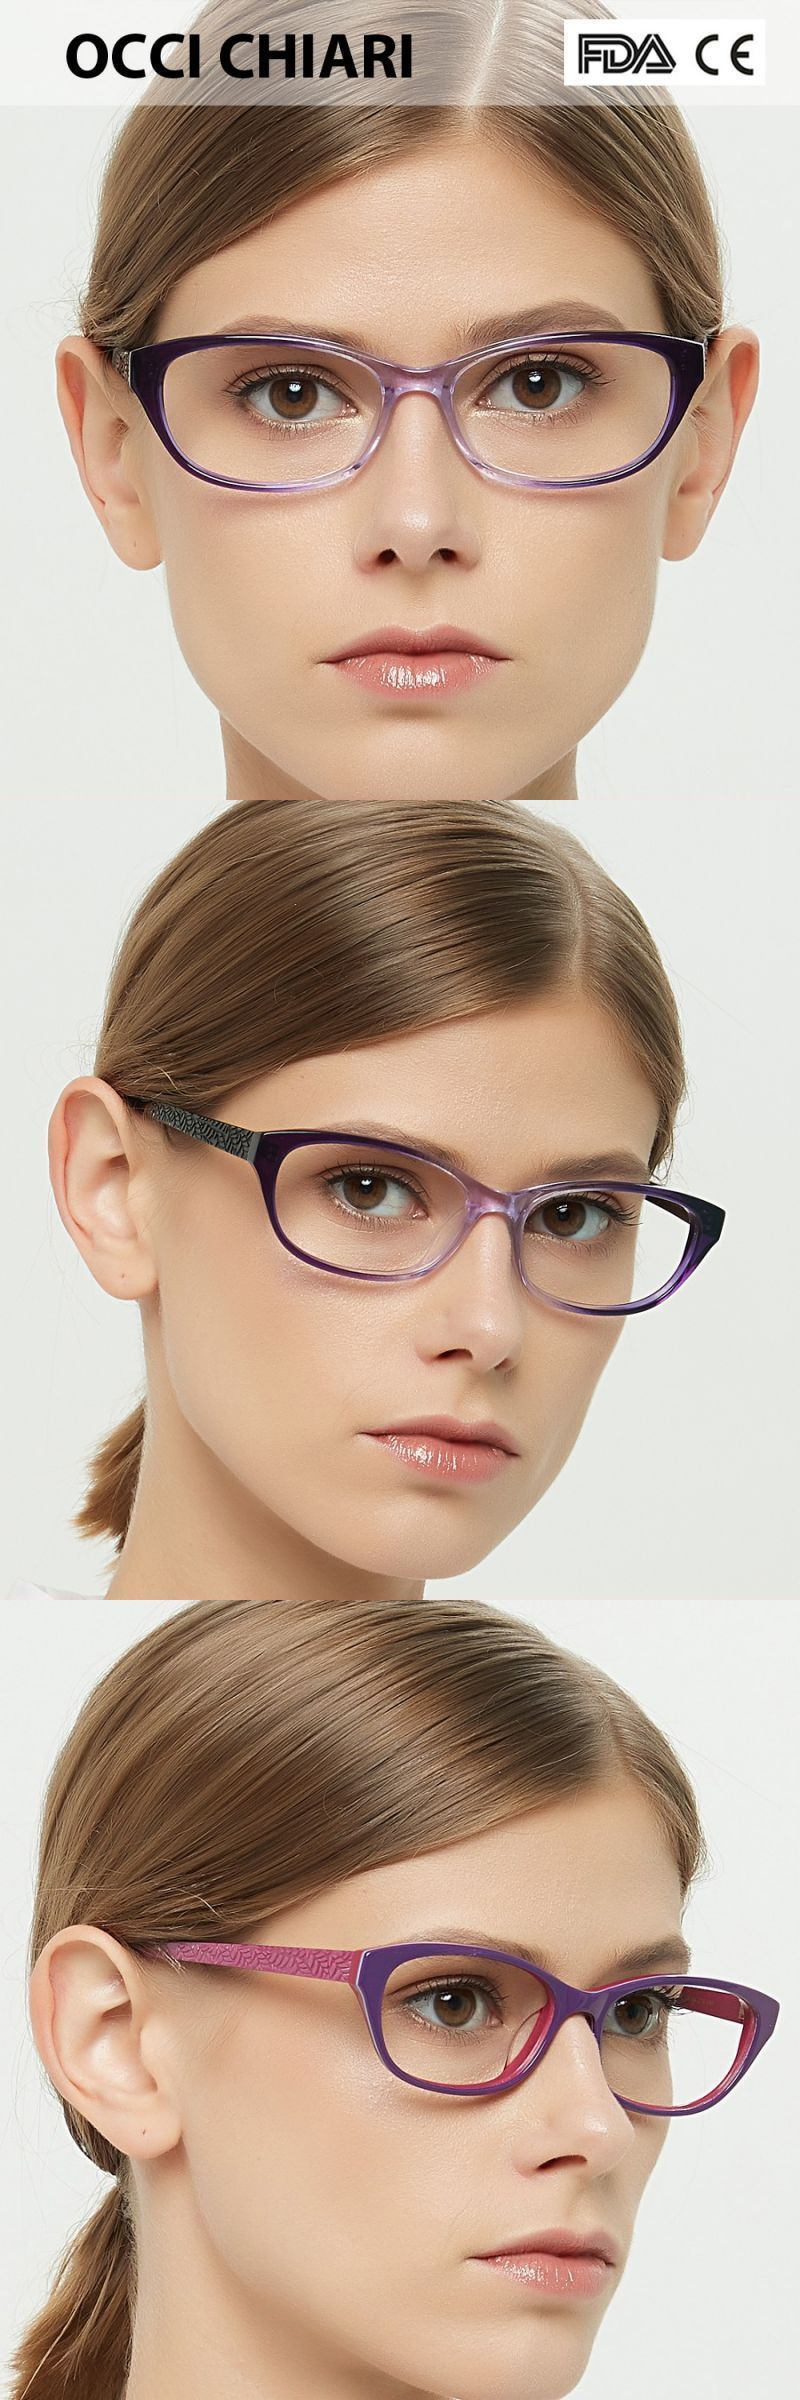 c0a36b85f472 Women cat eyes style eyeglasses prescription wine red myopia spectacle  student fashion glasses frame female w